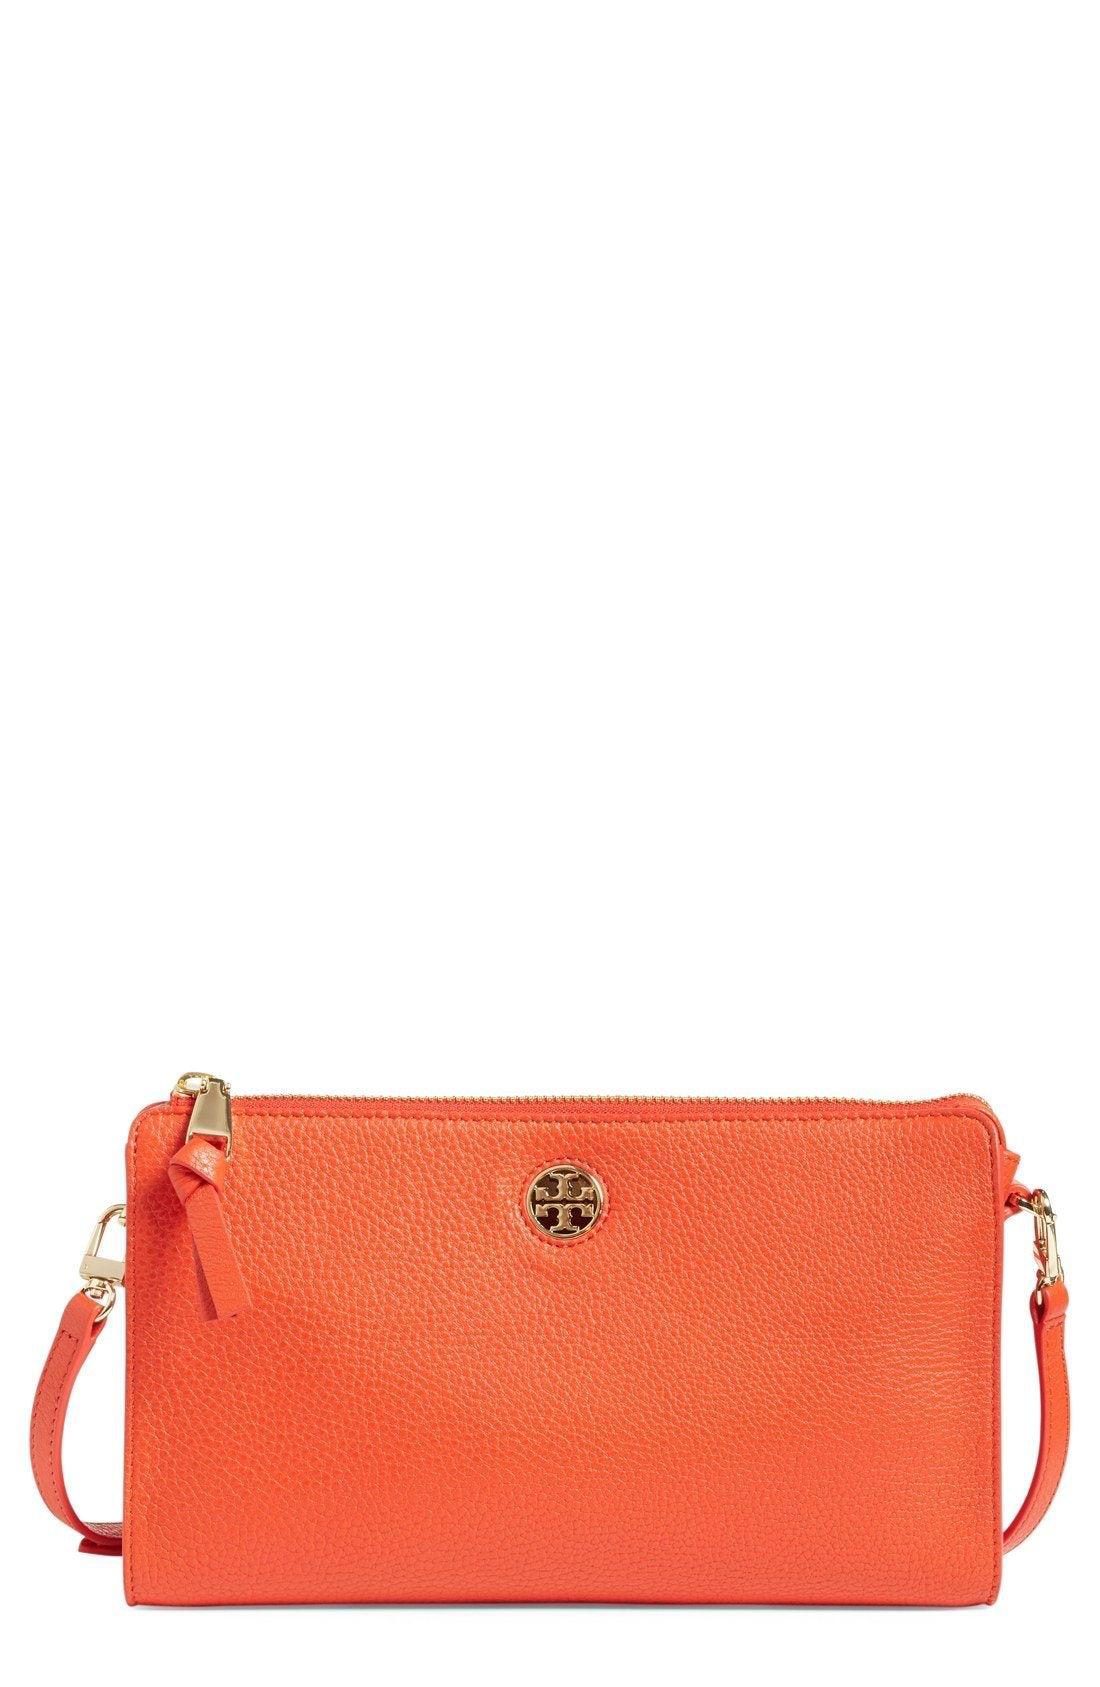 New Tory Burch Robinson Pebbled Leather Crossbody Wallet fashion online. [$225]?@shop.seehandbags<<